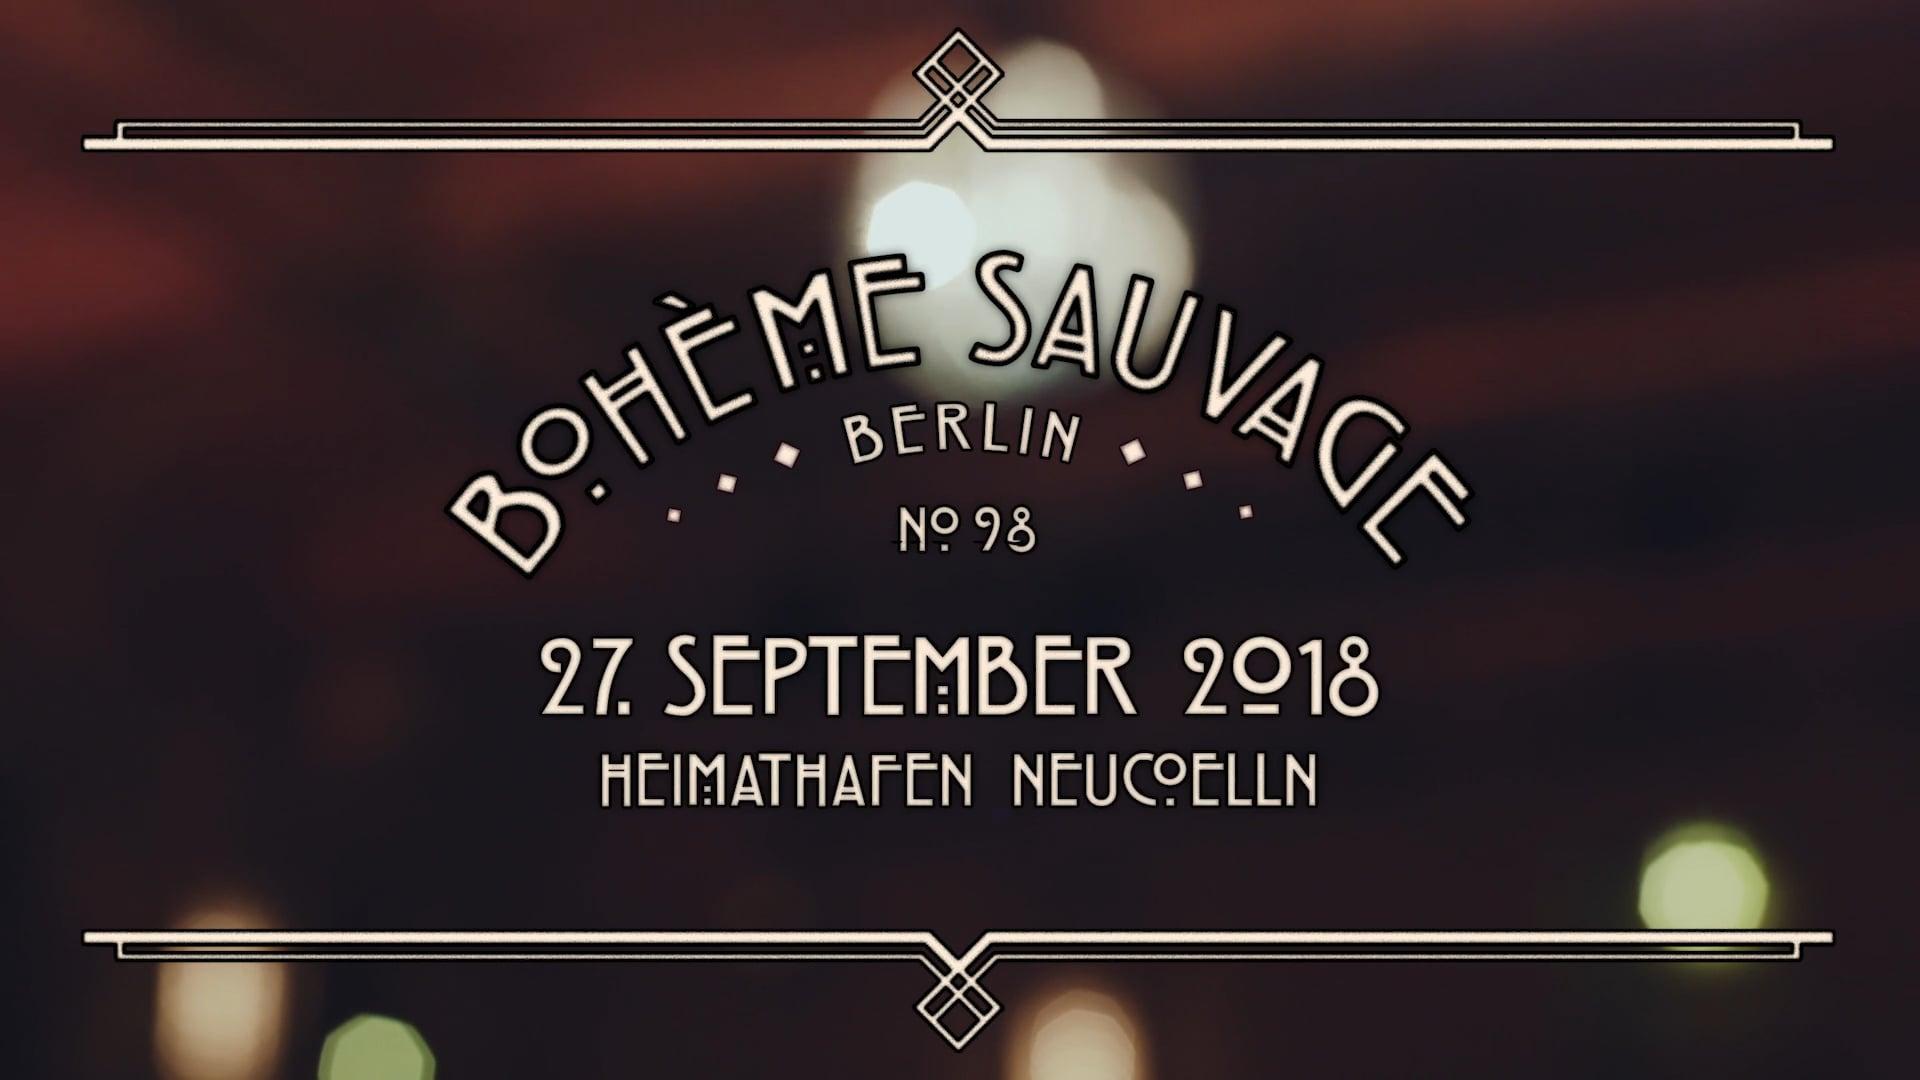 Bohème Sauvage Berlin Nº98 - 29. September 2018 - Heimathafen